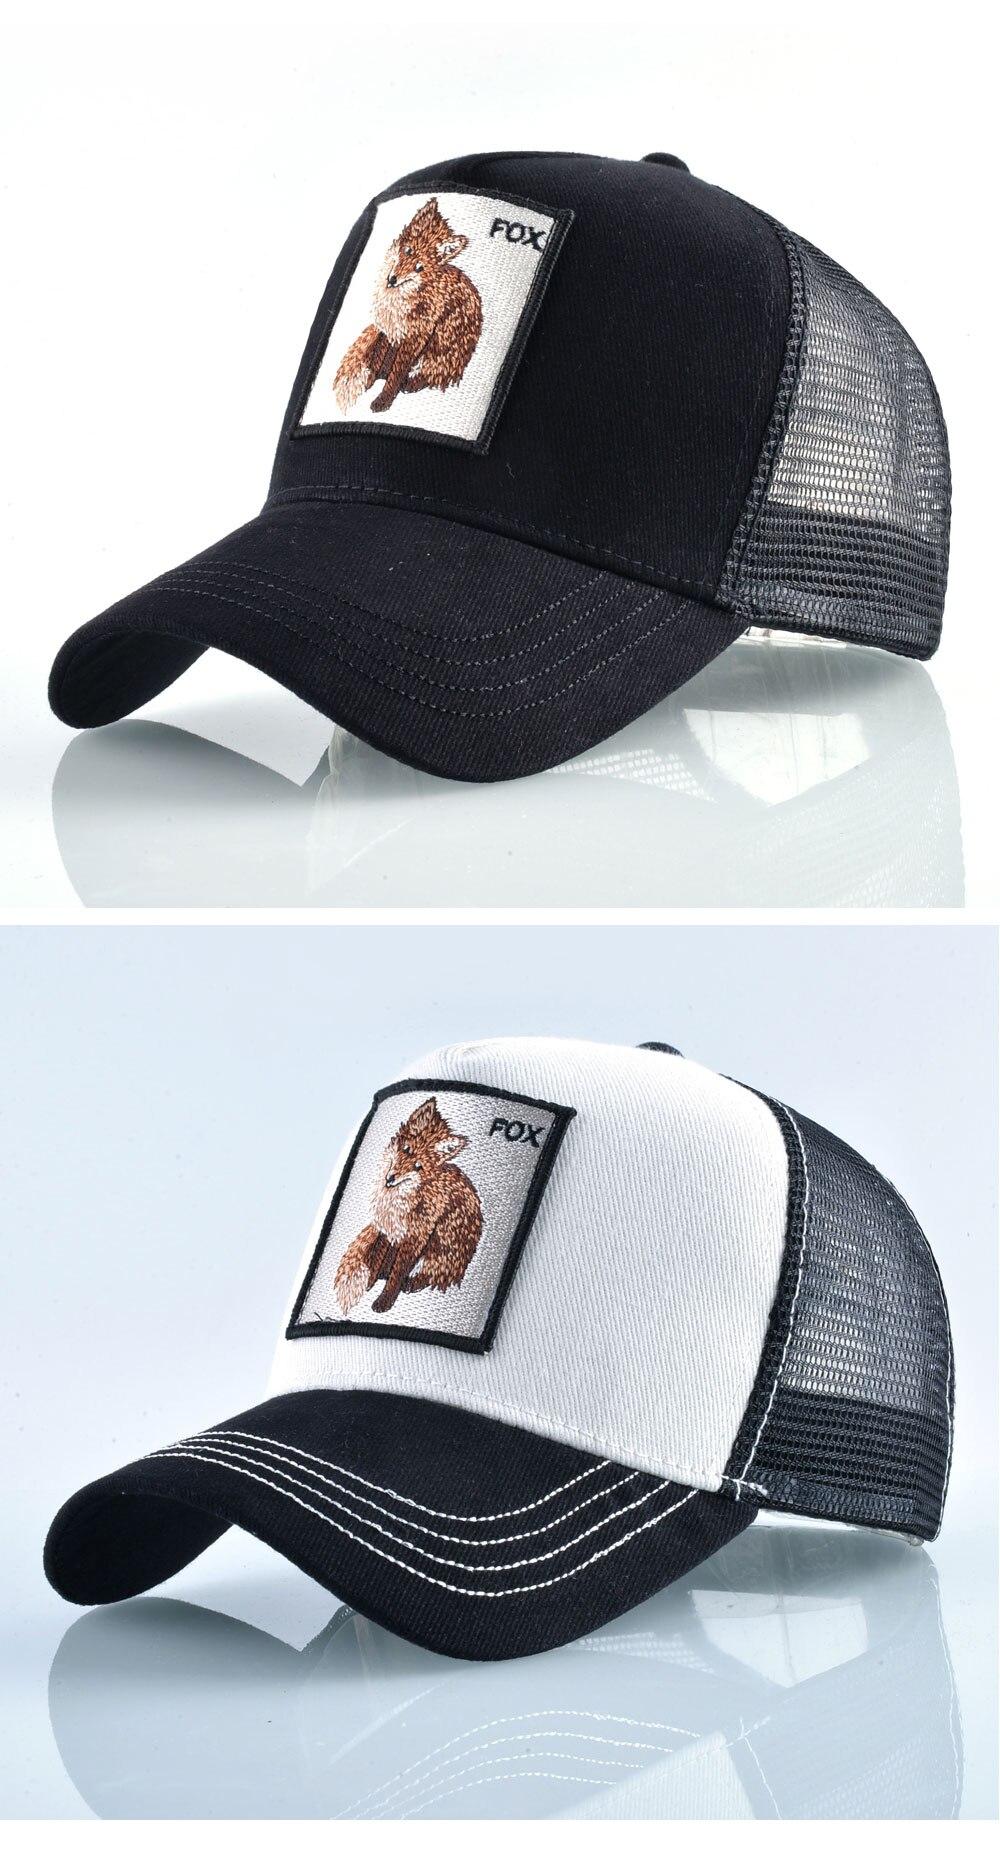 b622139385c36 Cotton Snapback caps for men Embroidery Fox Baseball Cap Women s Breathable  Mesh Trucker Hat Unisex Patch Hip Hop Bone Casquette